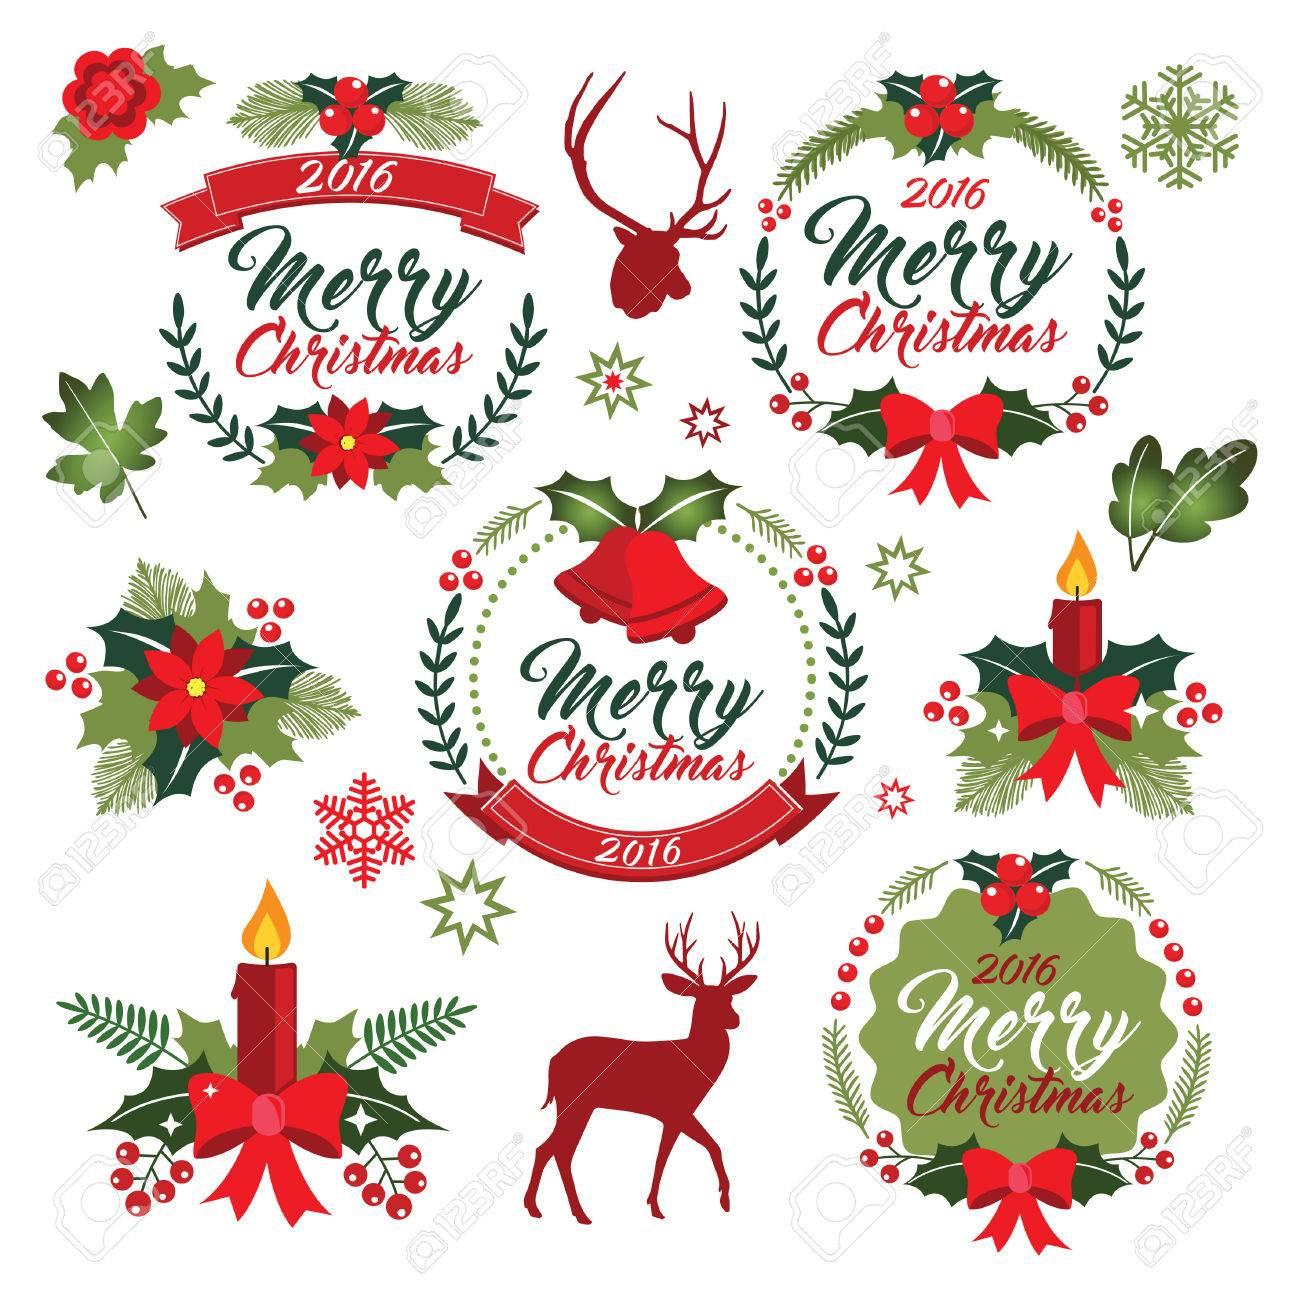 Christmas Wreath Clipart.Christmas Wreath Clipart Xmas Ornament Christmas Vectron Graphic